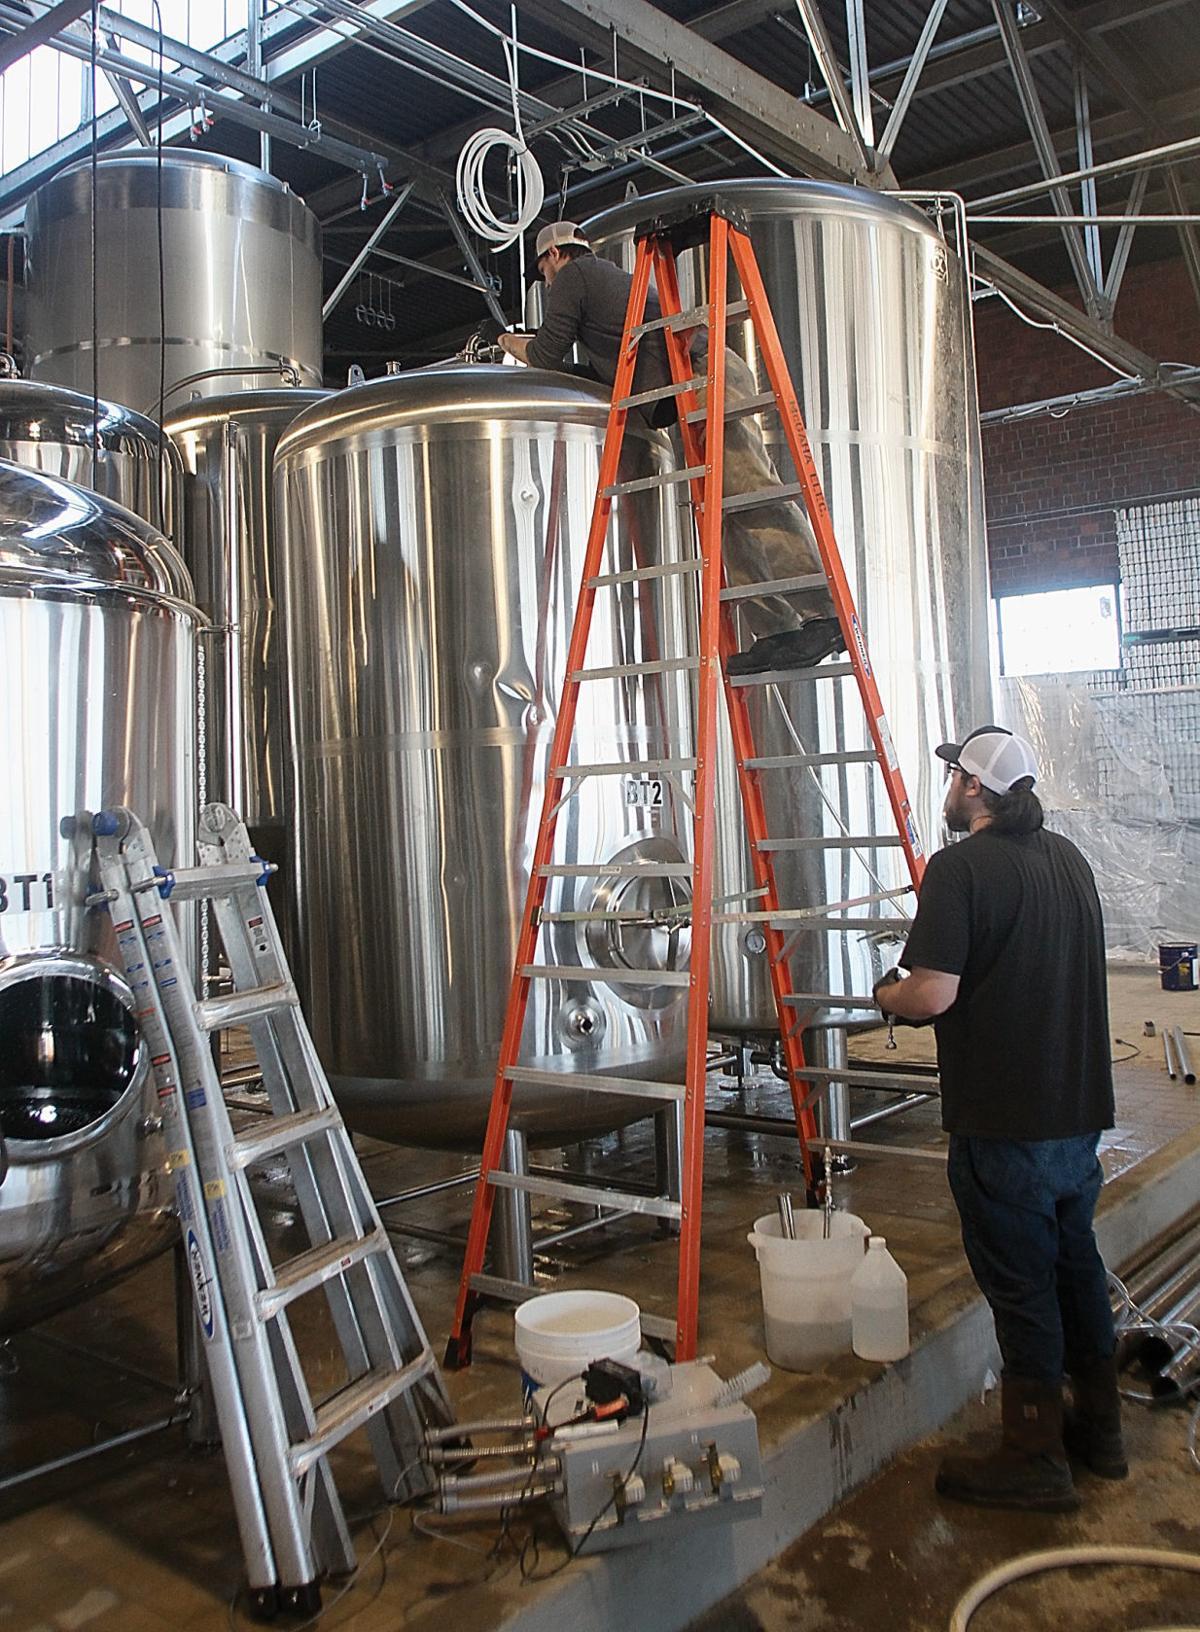 Blackhorse Brewery opens this week in Alcoa | News